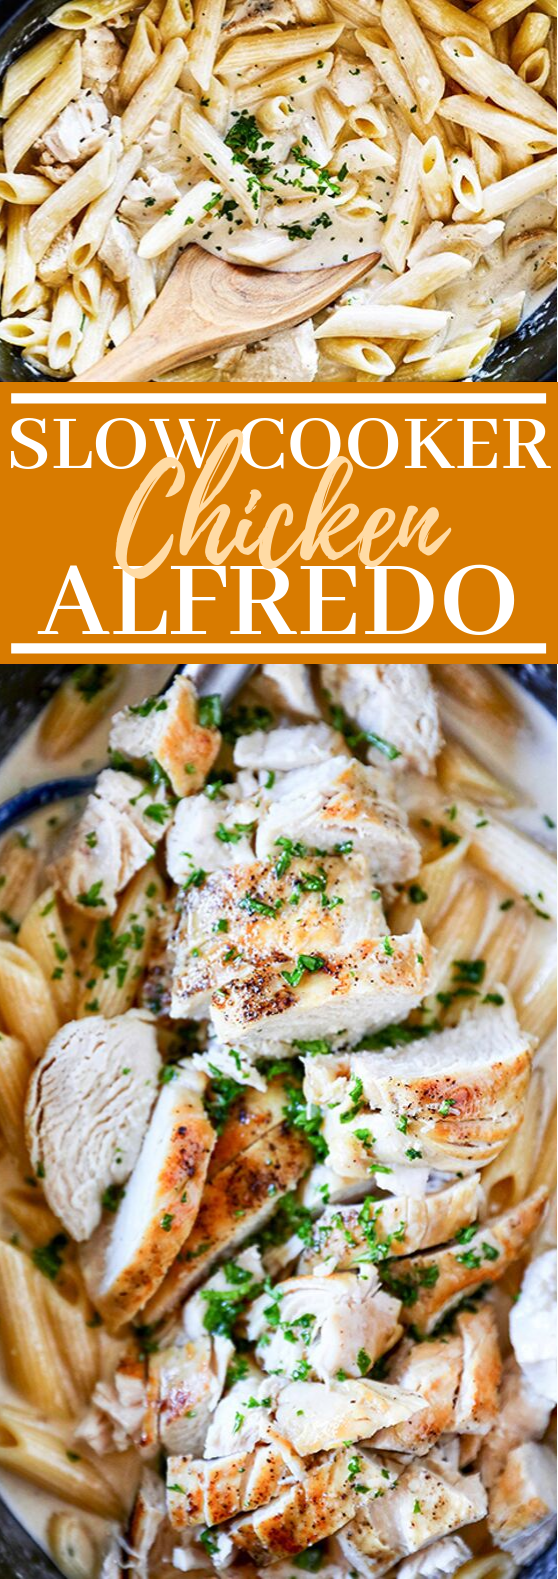 Slow Cooker Chicken Alfredo #dinner #pasta